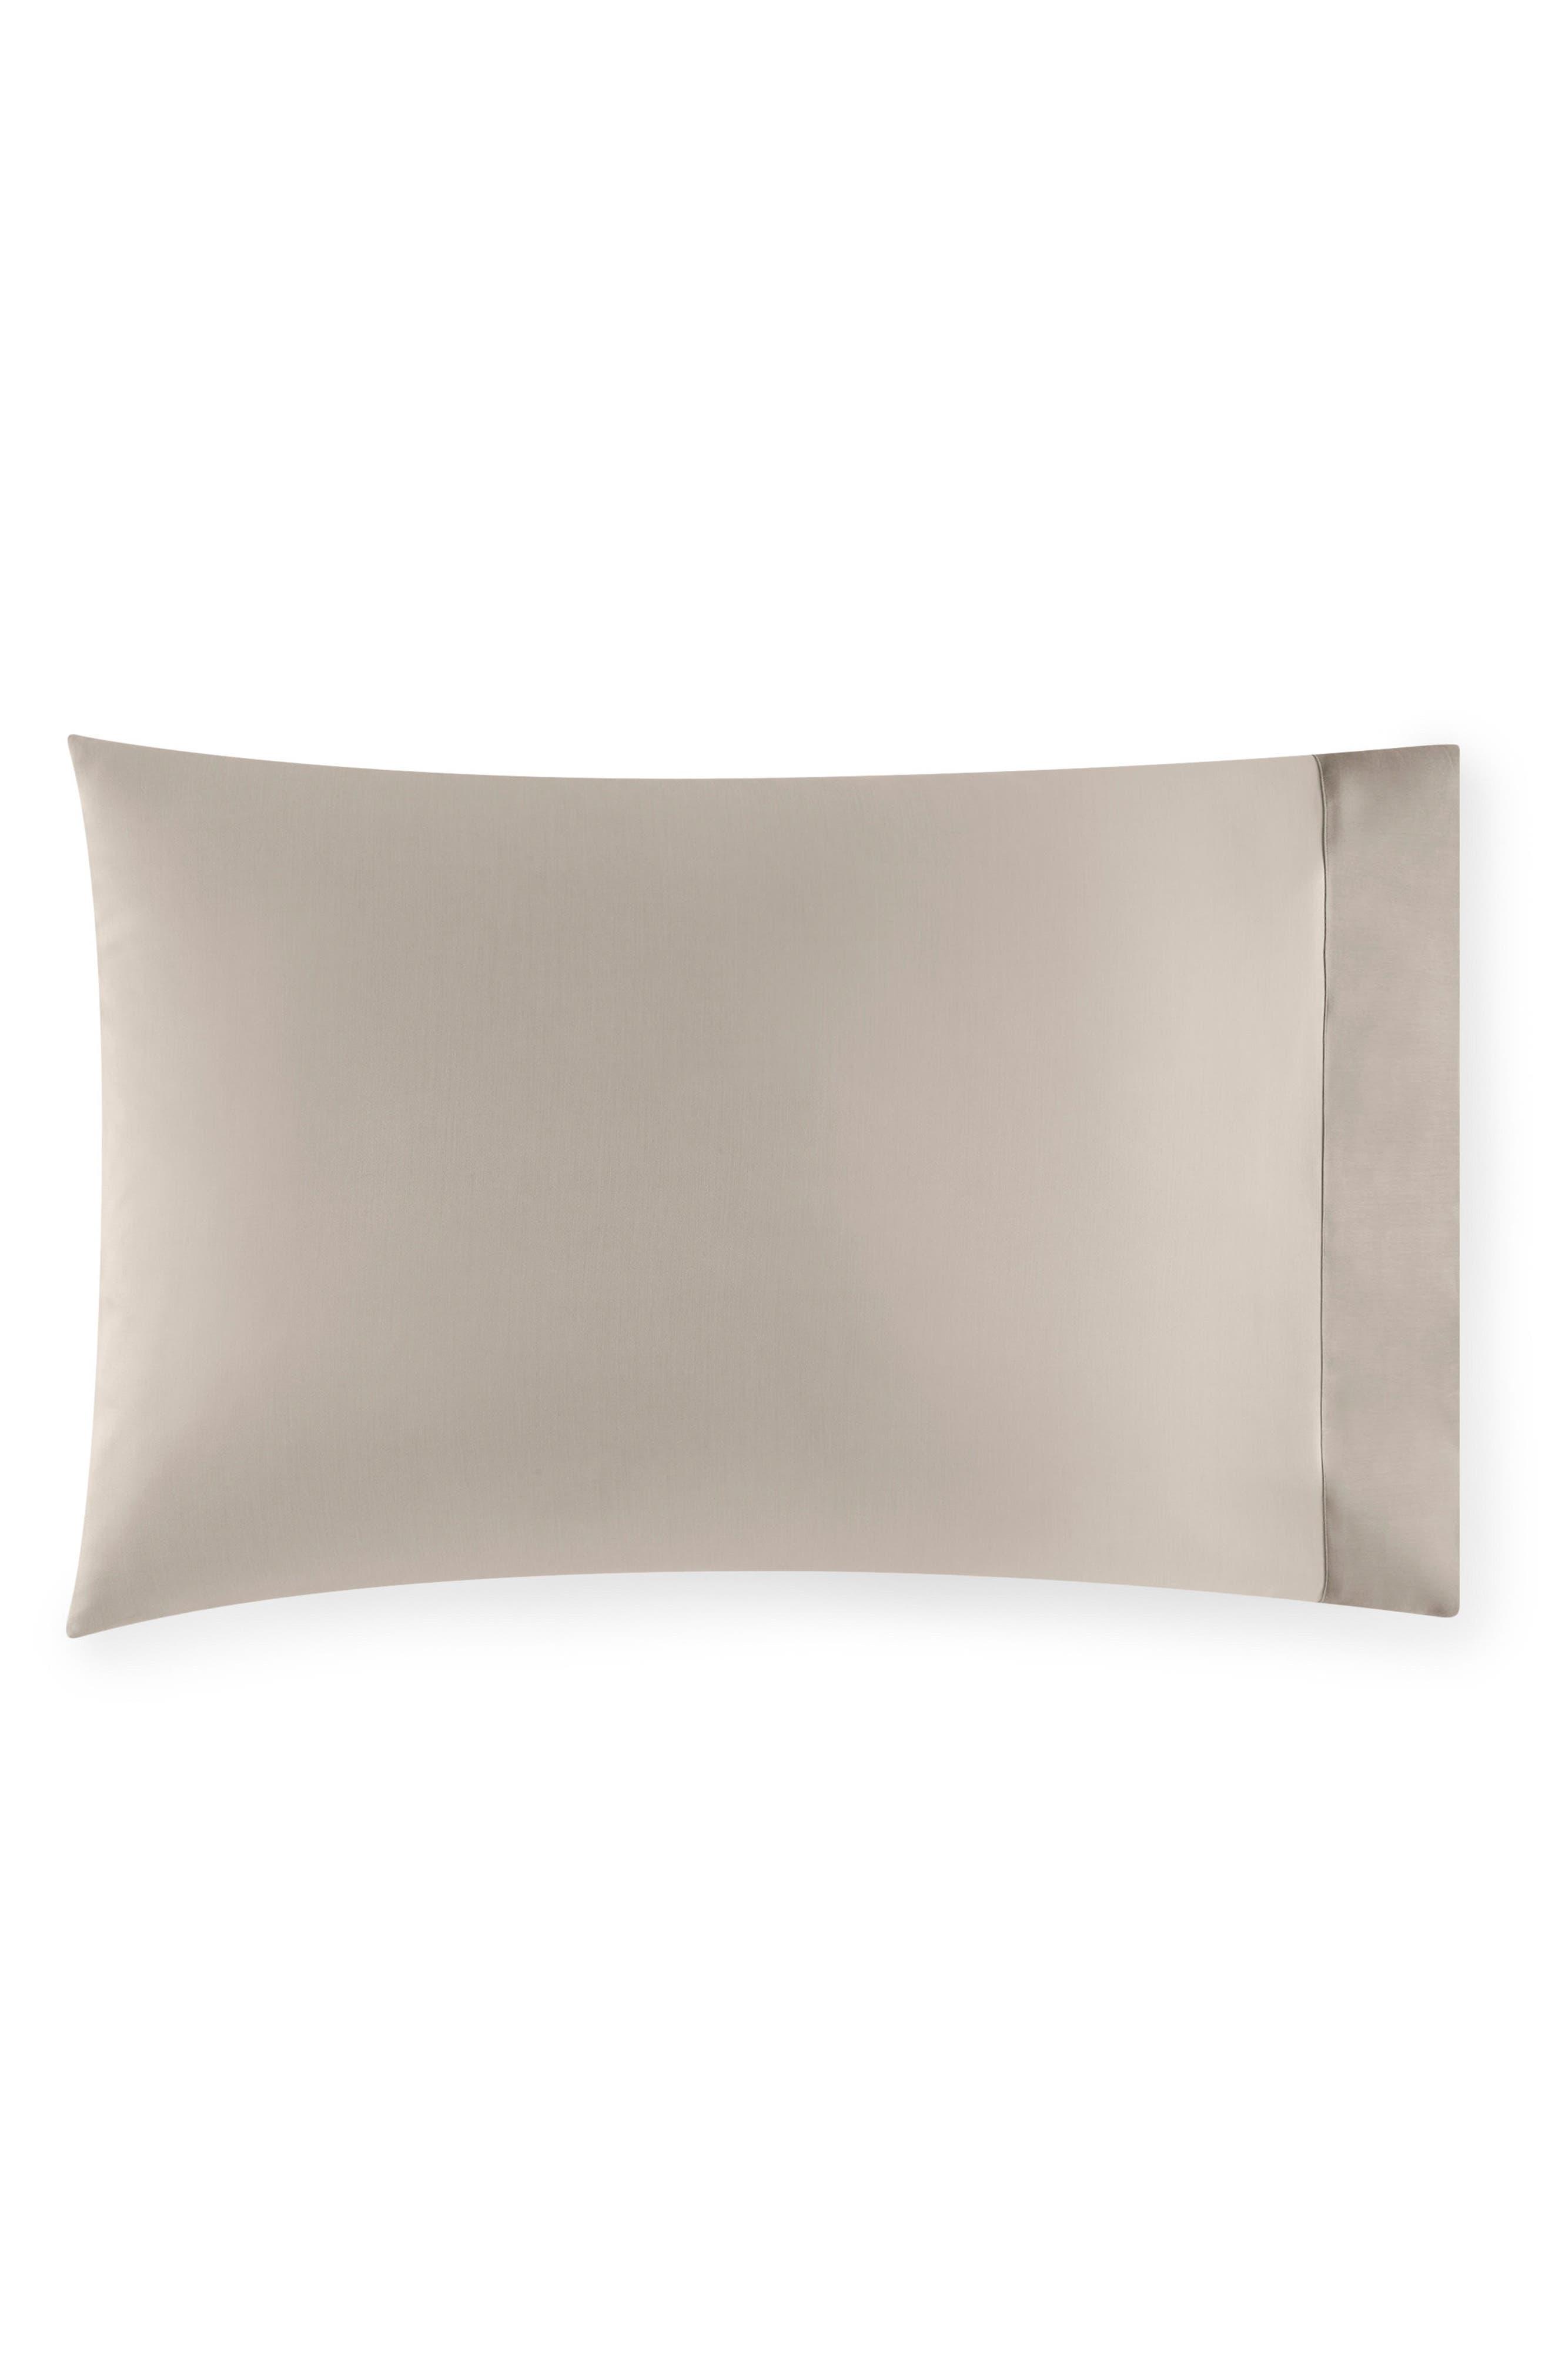 Alternate Image 1 Selected - SFERRA Larro Pillowcase